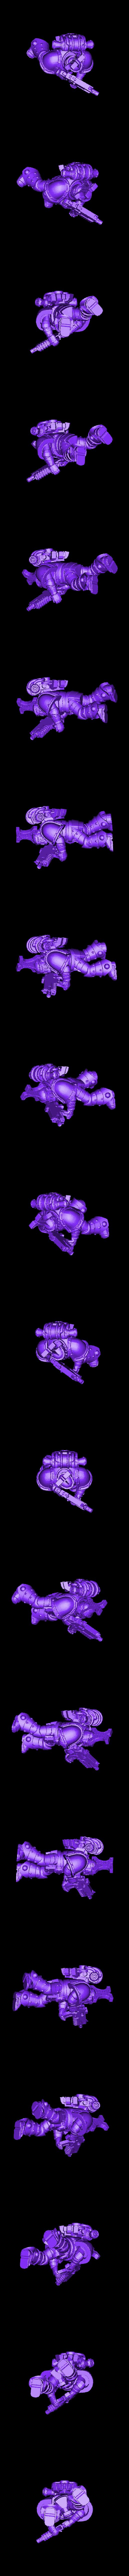 Marine_4v3.stl Download free STL file Rubric Marines • 3D printer design, Mazer